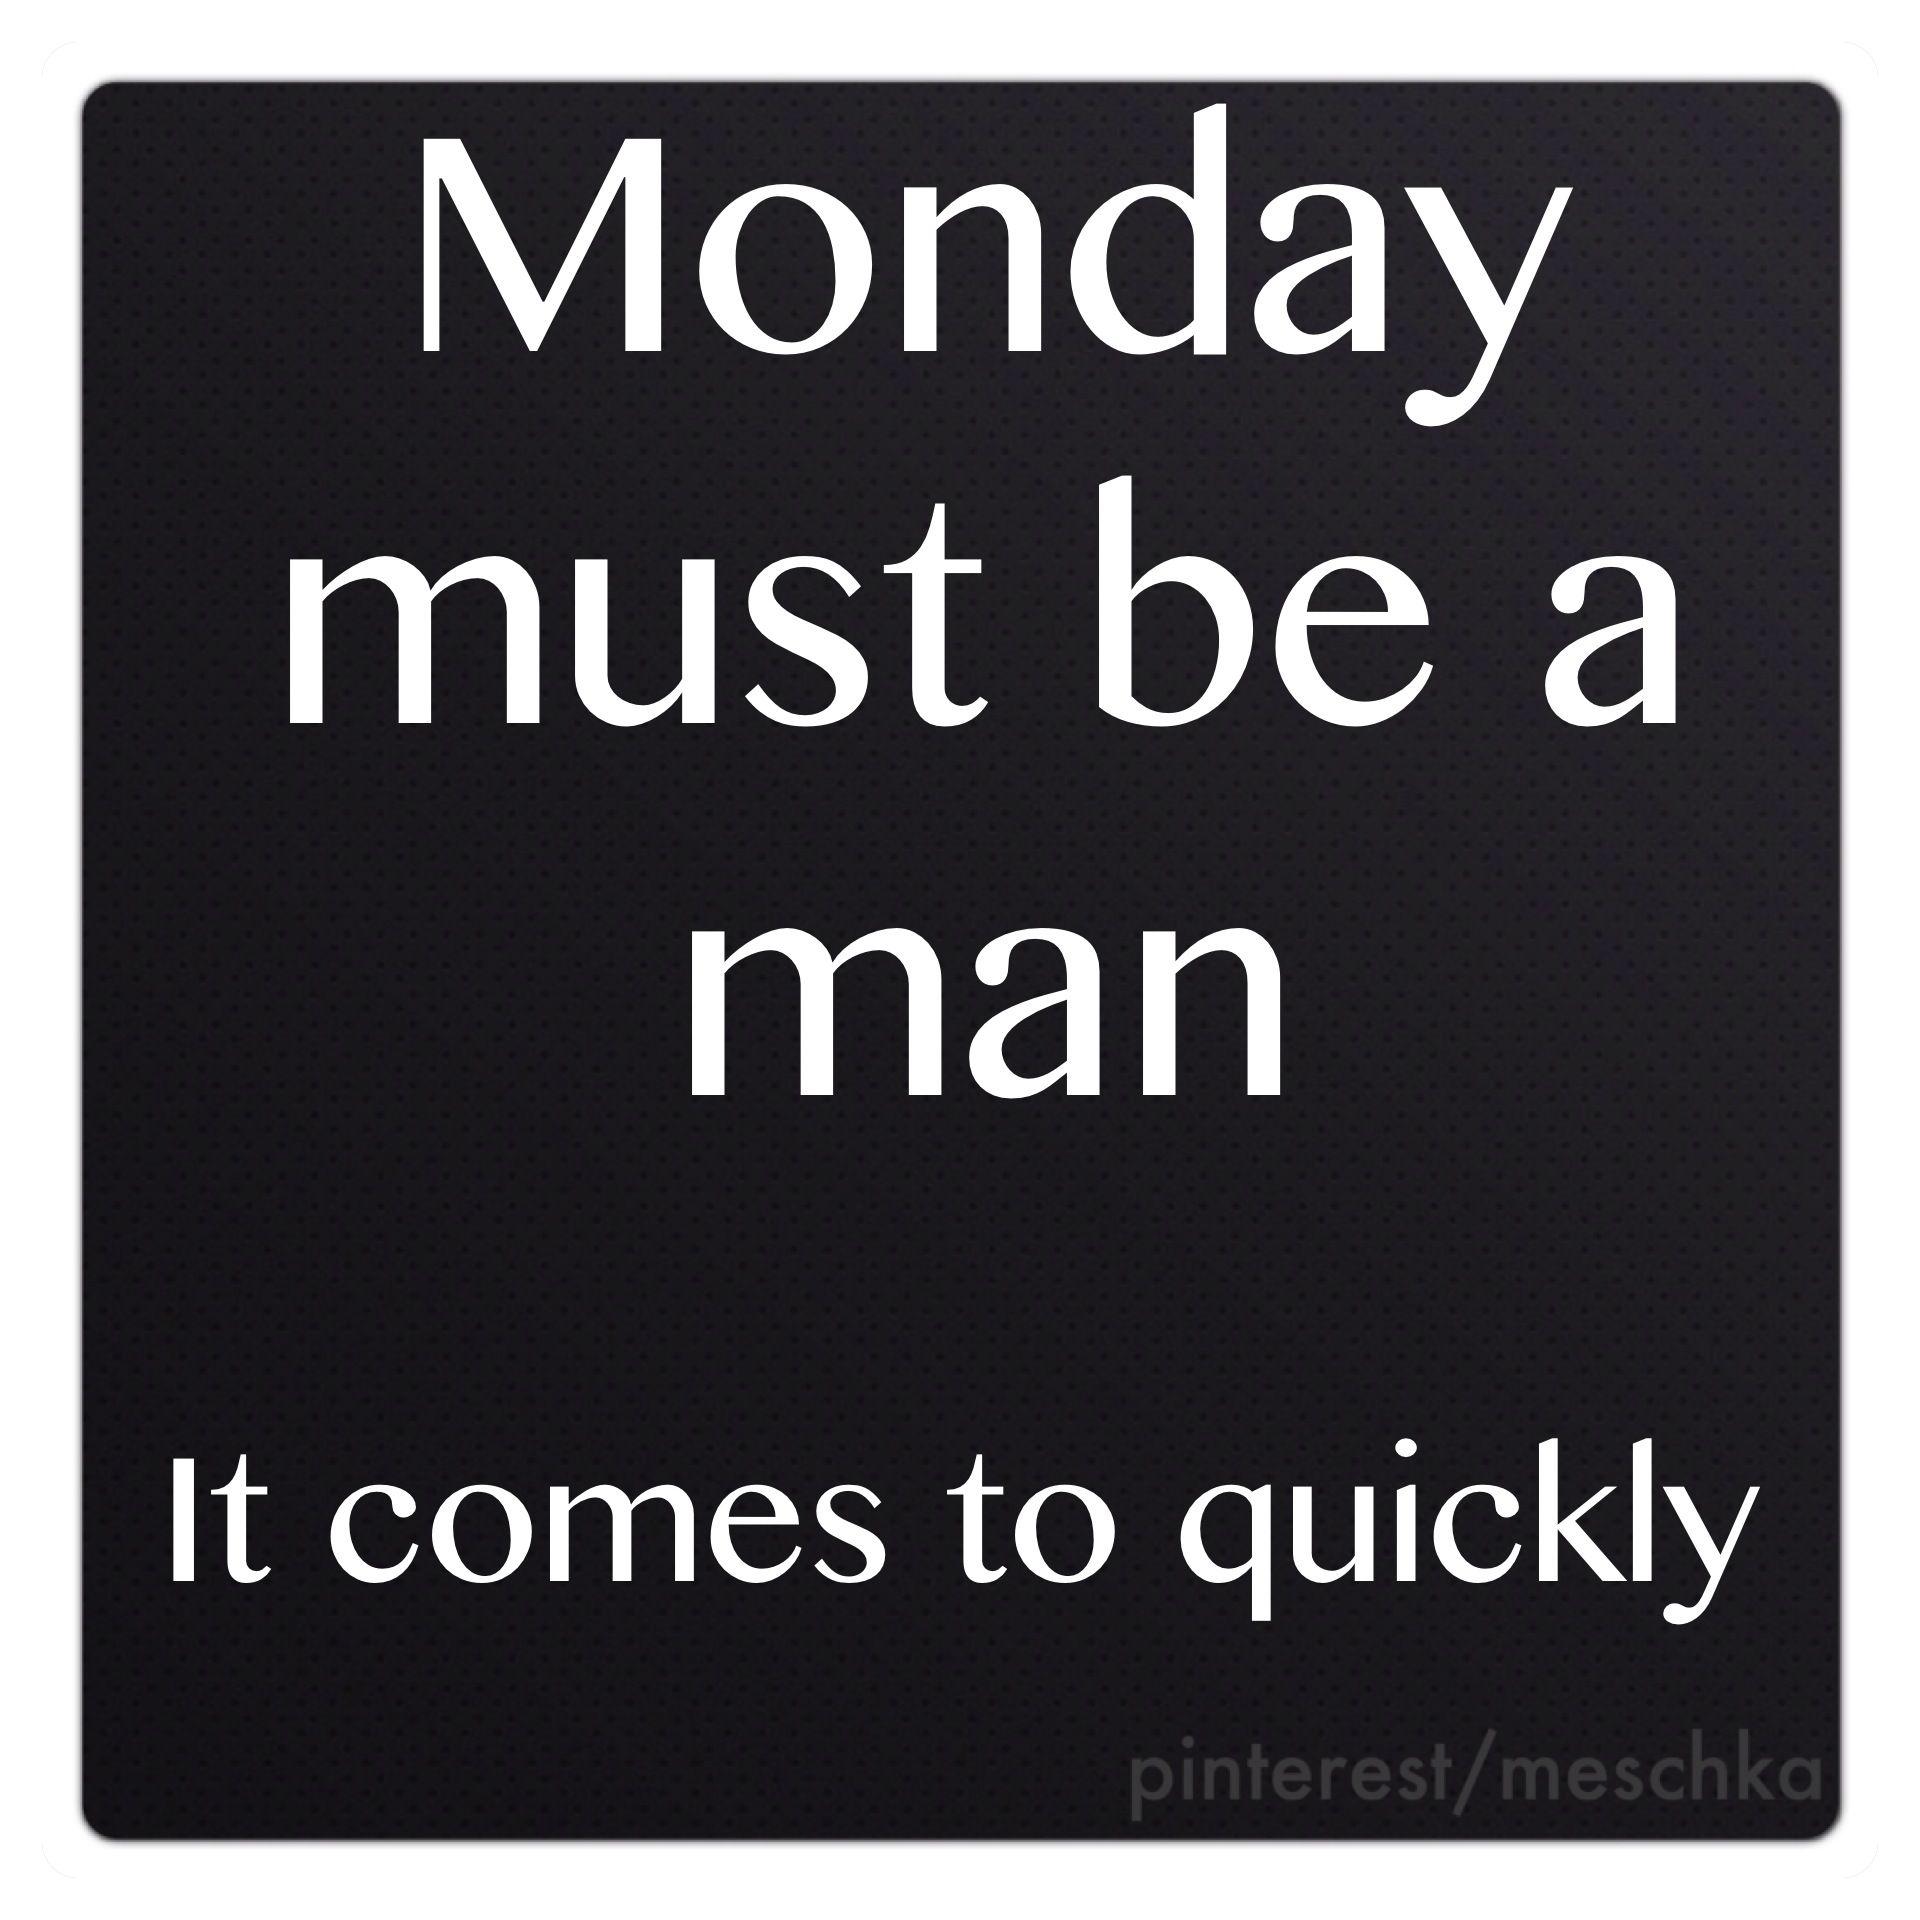 Adult Humor Quotes: Monday .. Dirty Joke